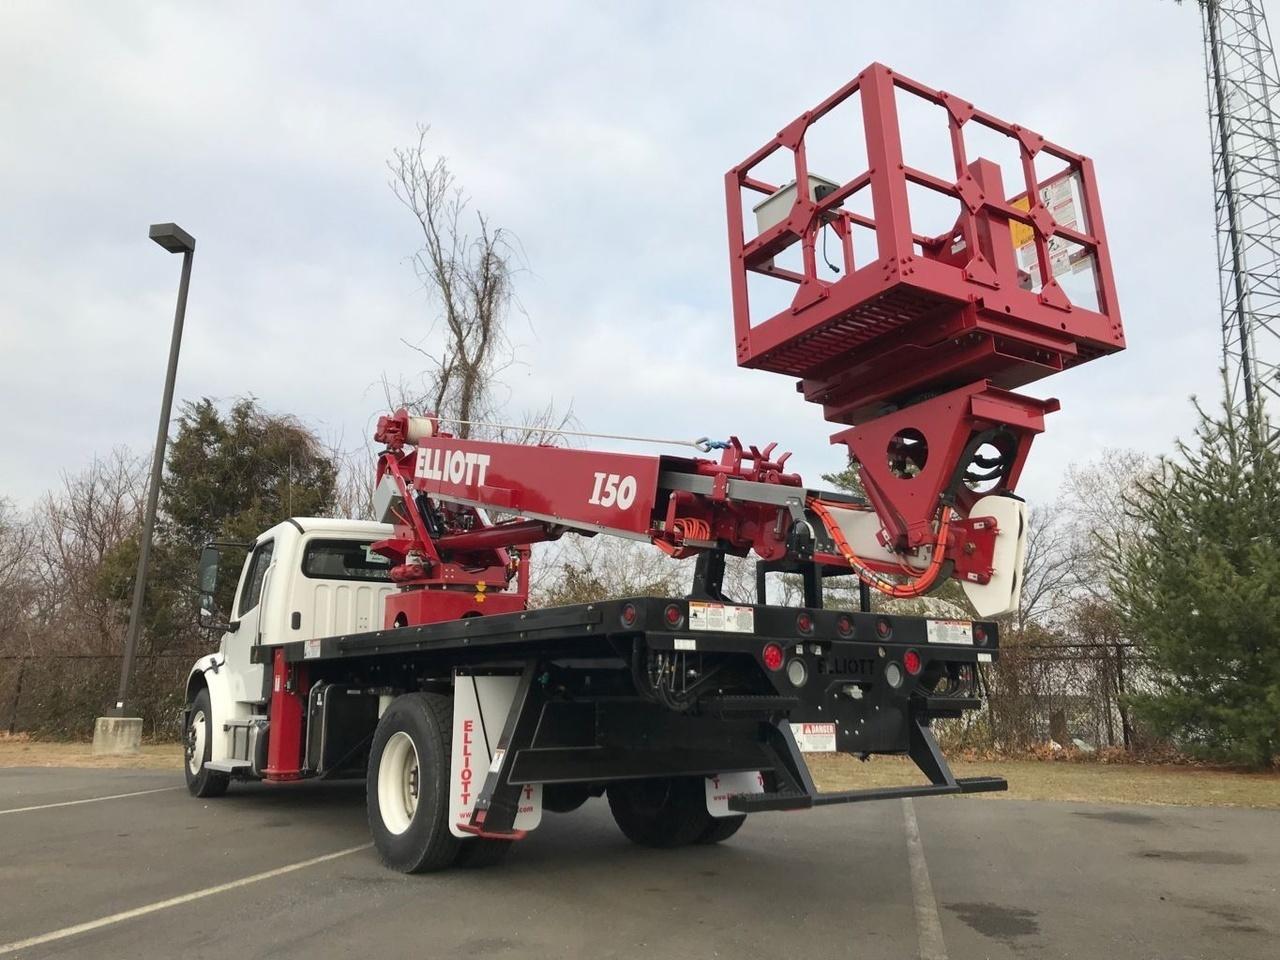 2016 Freightliner M2106 4x2 Elliott I50F Bucket Truck